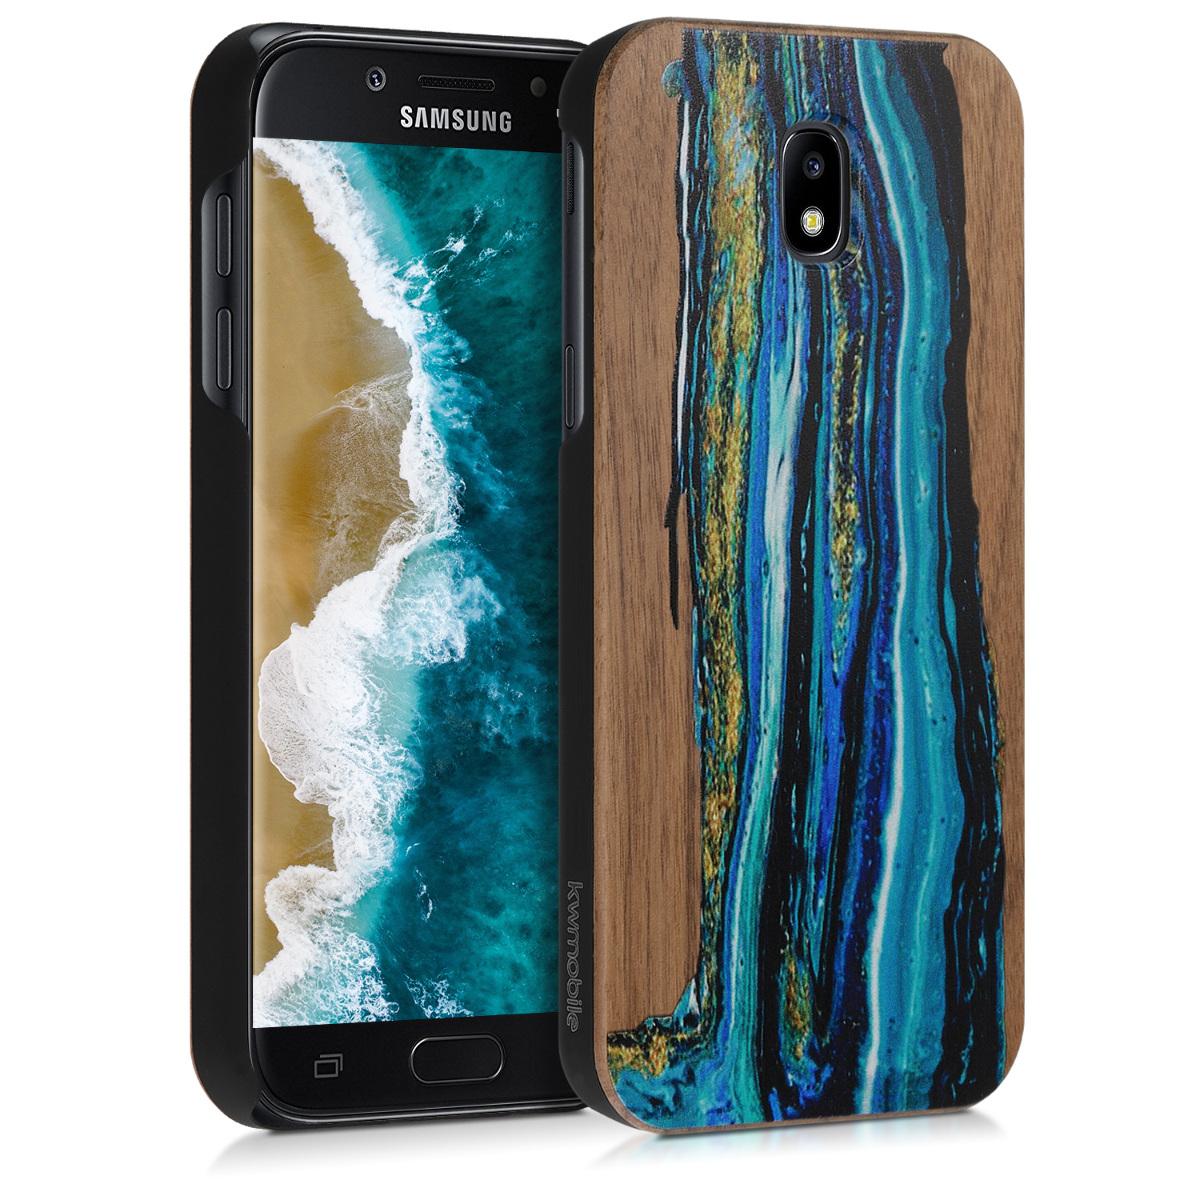 KW Ξύλινη Θήκη Samsung Galaxy J5 2017 - Καφέ/ σχέδιο θάλασσα (47351.01)